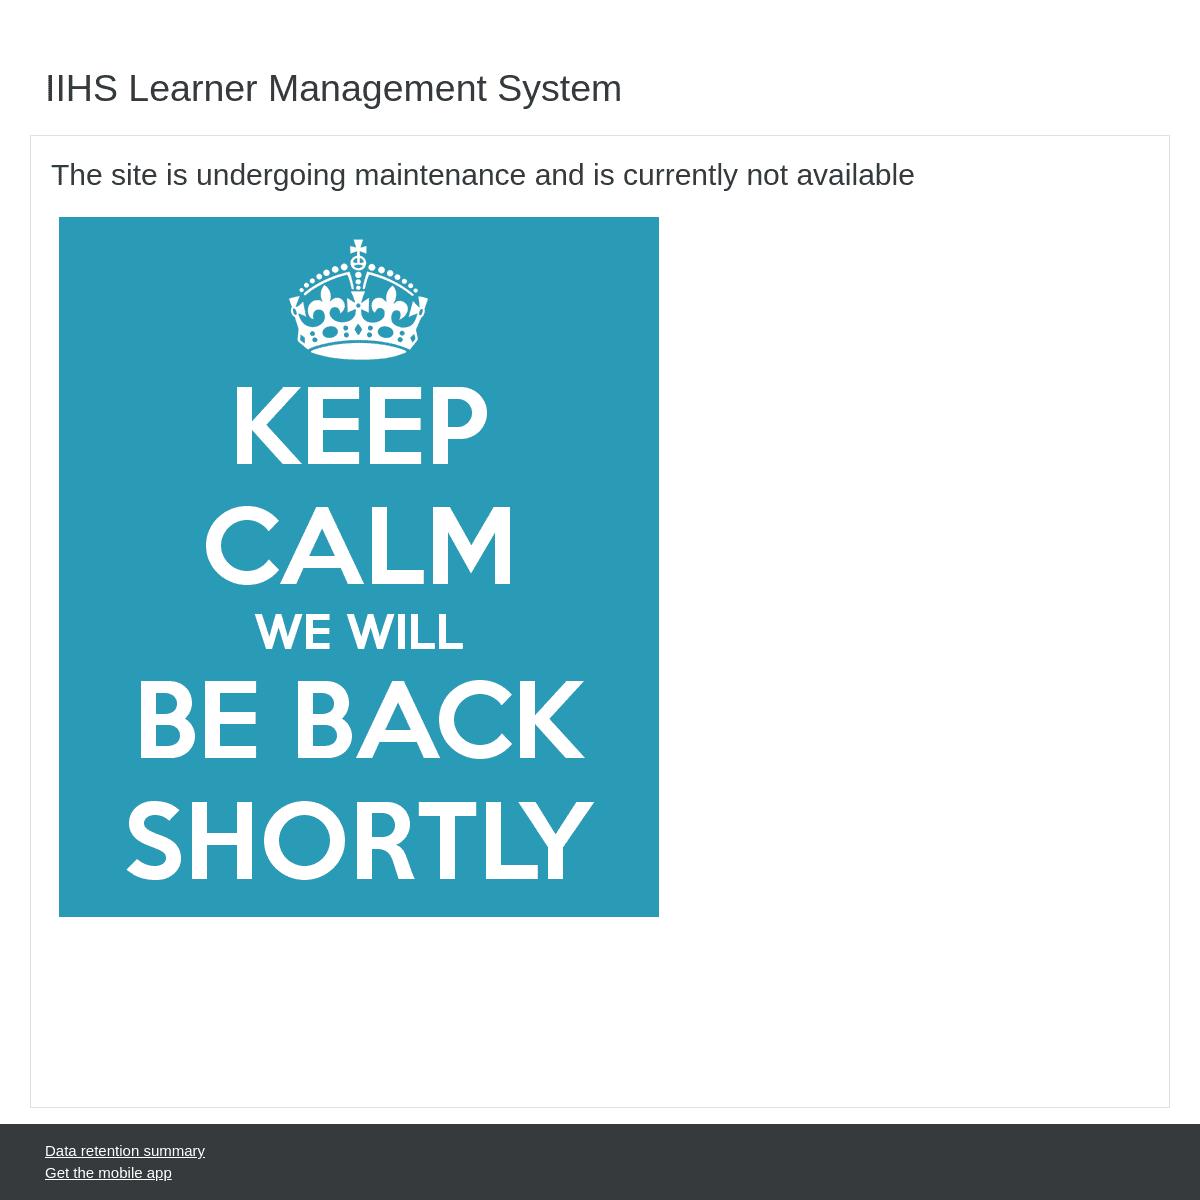 ArchiveBay.com - iihs.edu.lk - IIHS Learner Management System - In maintenance mode